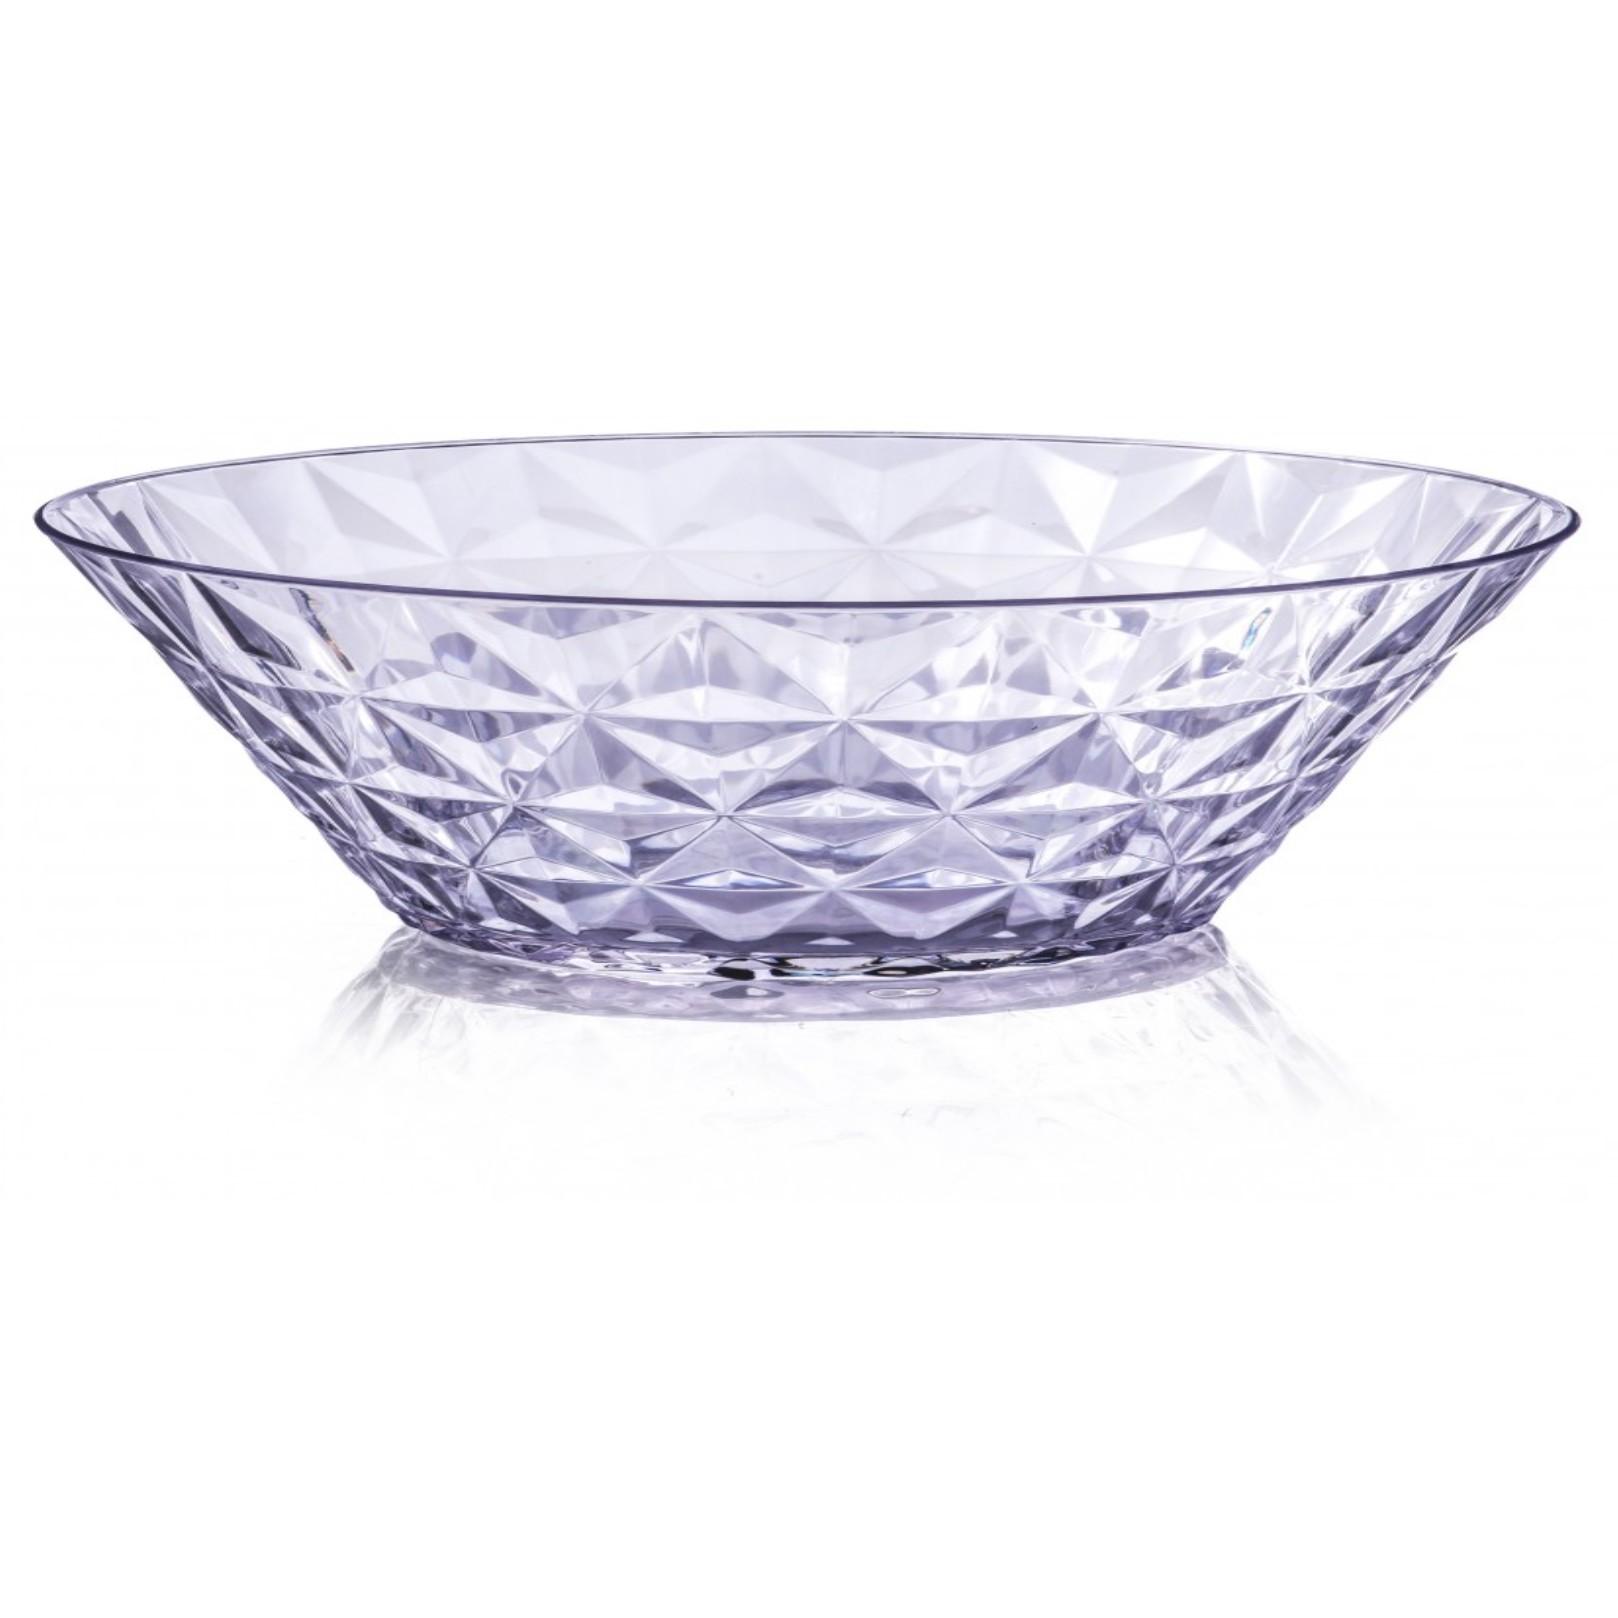 Saladeira Funda de Plastico Redonda 3L Transparente - Plasvale